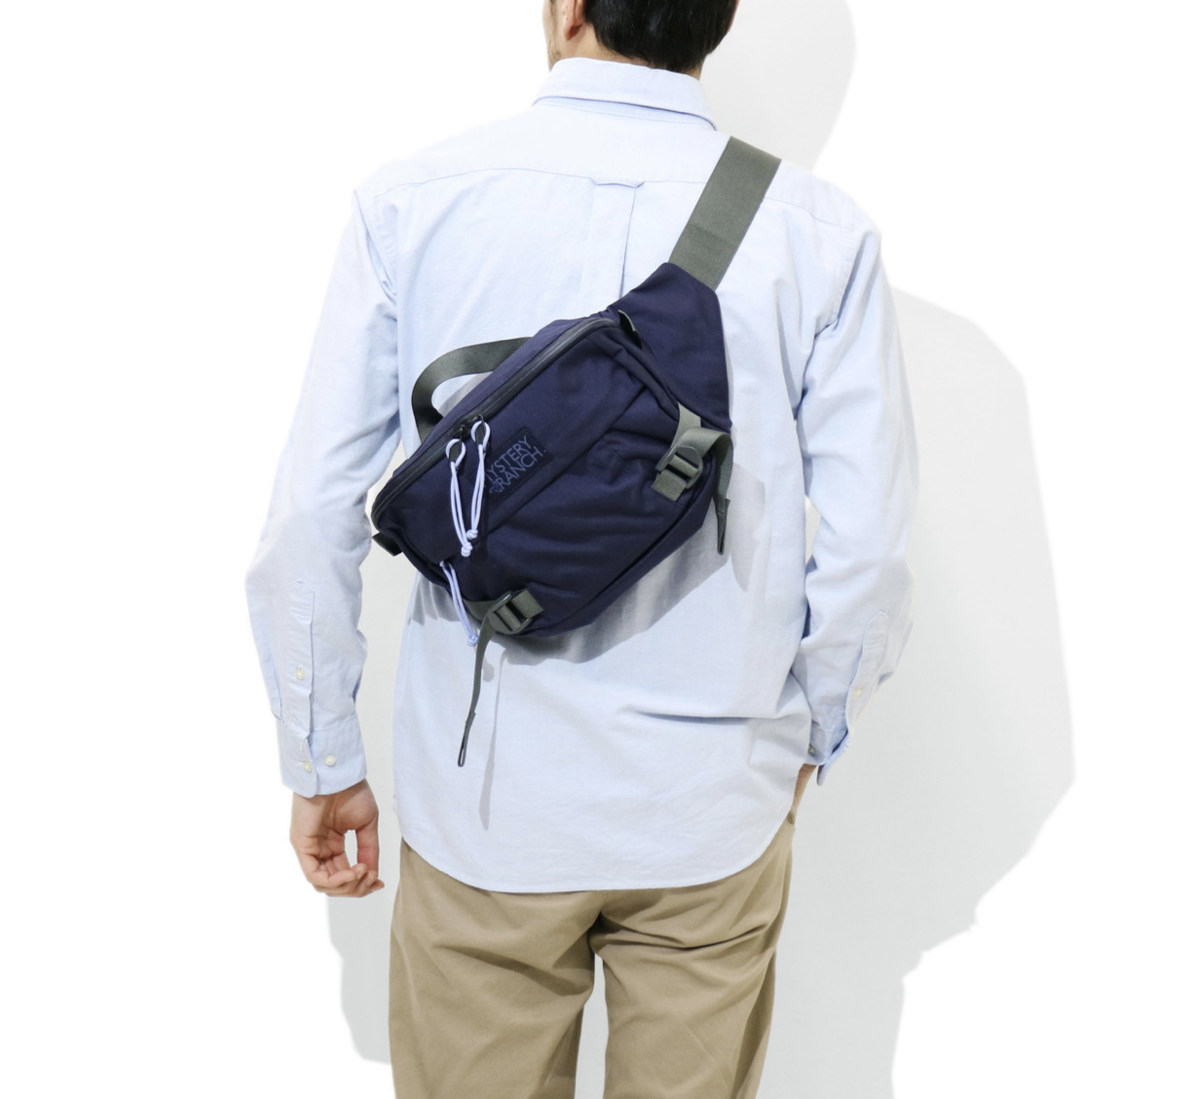 f:id:thebackpack:20190317114410p:plain